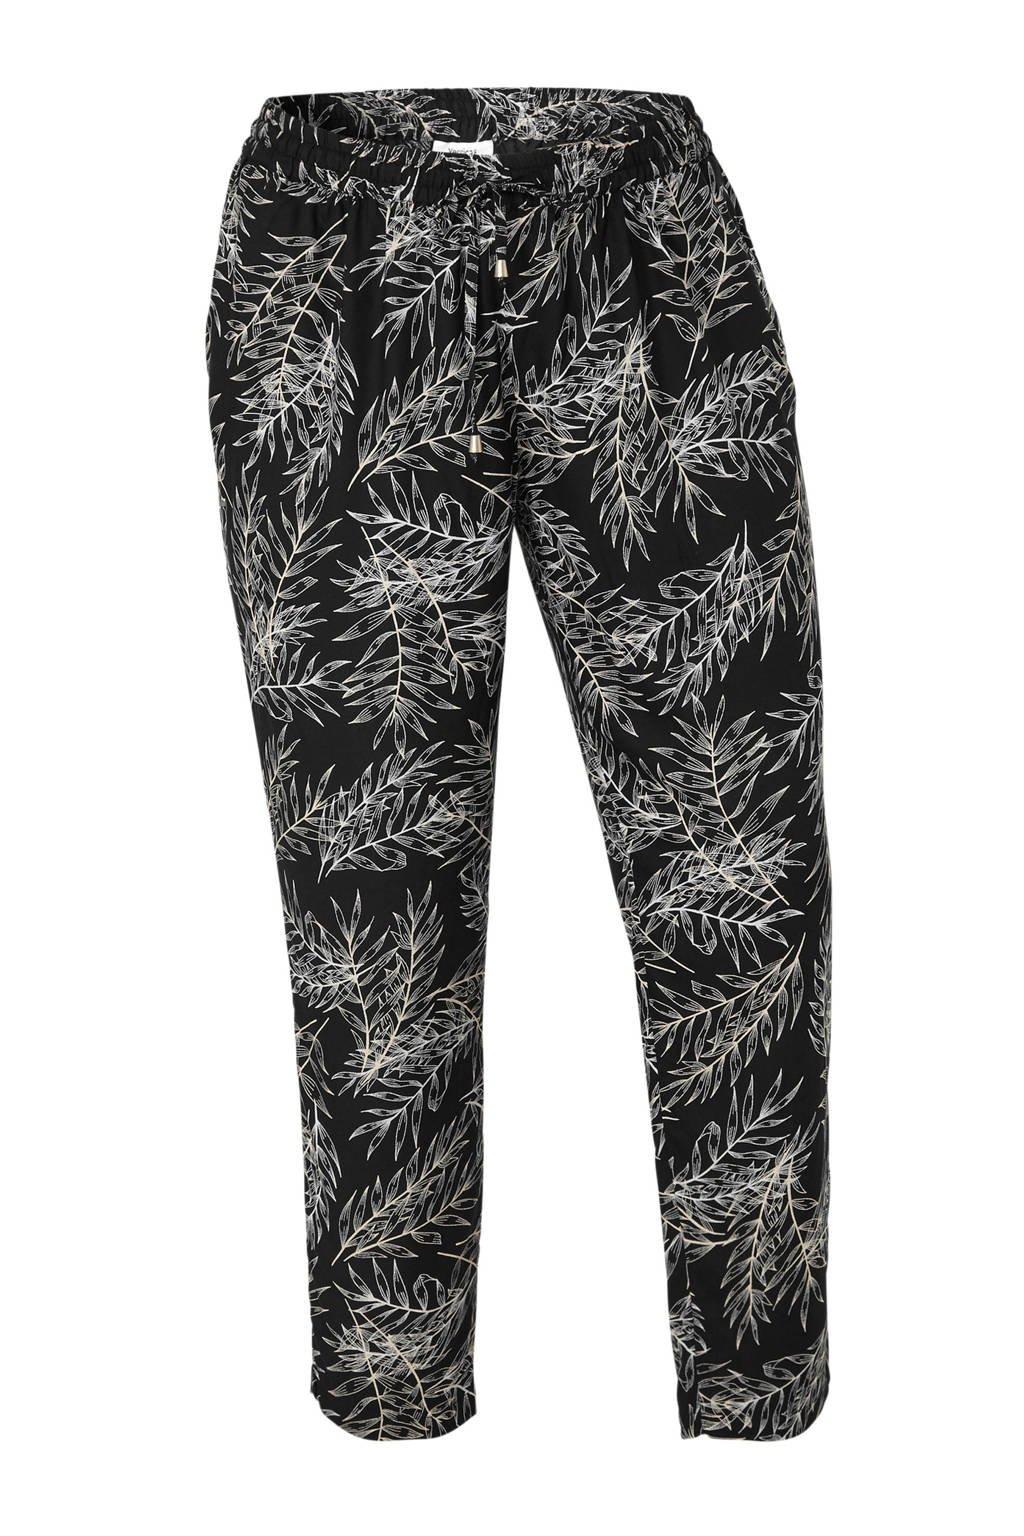 C&A XL Yessica tapered fit broek met bladprint zwart, Zwart